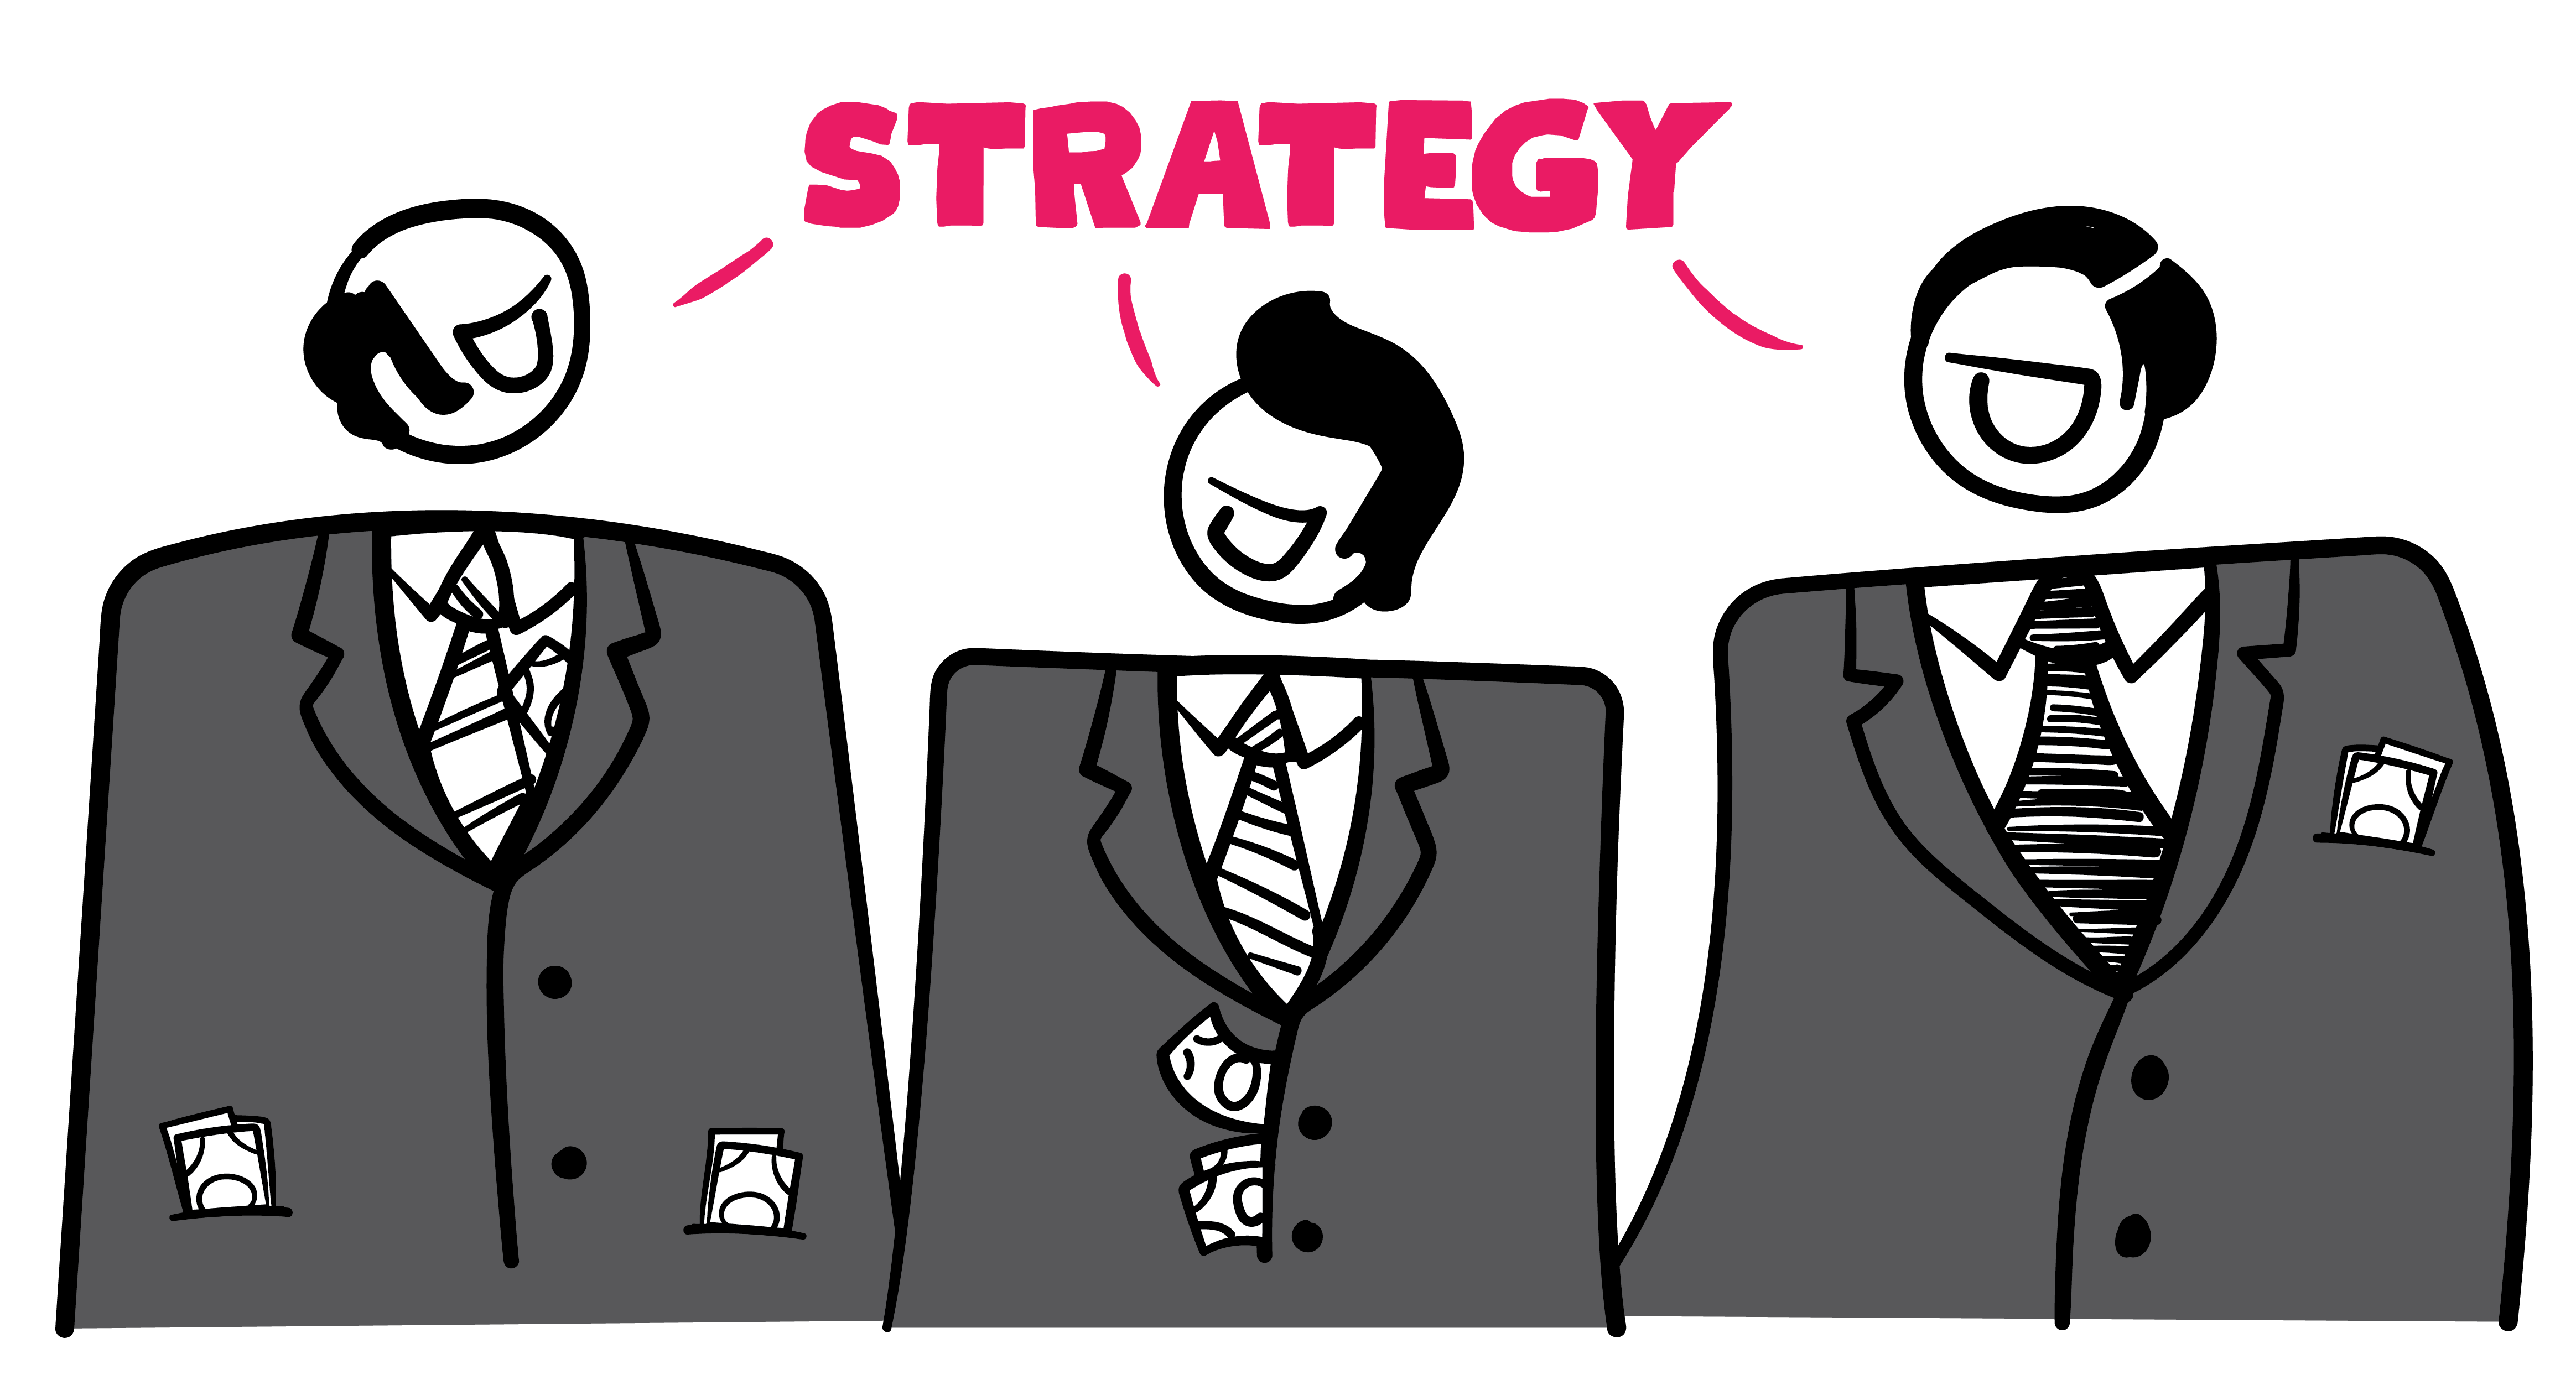 Strategy-02-NotStrategy